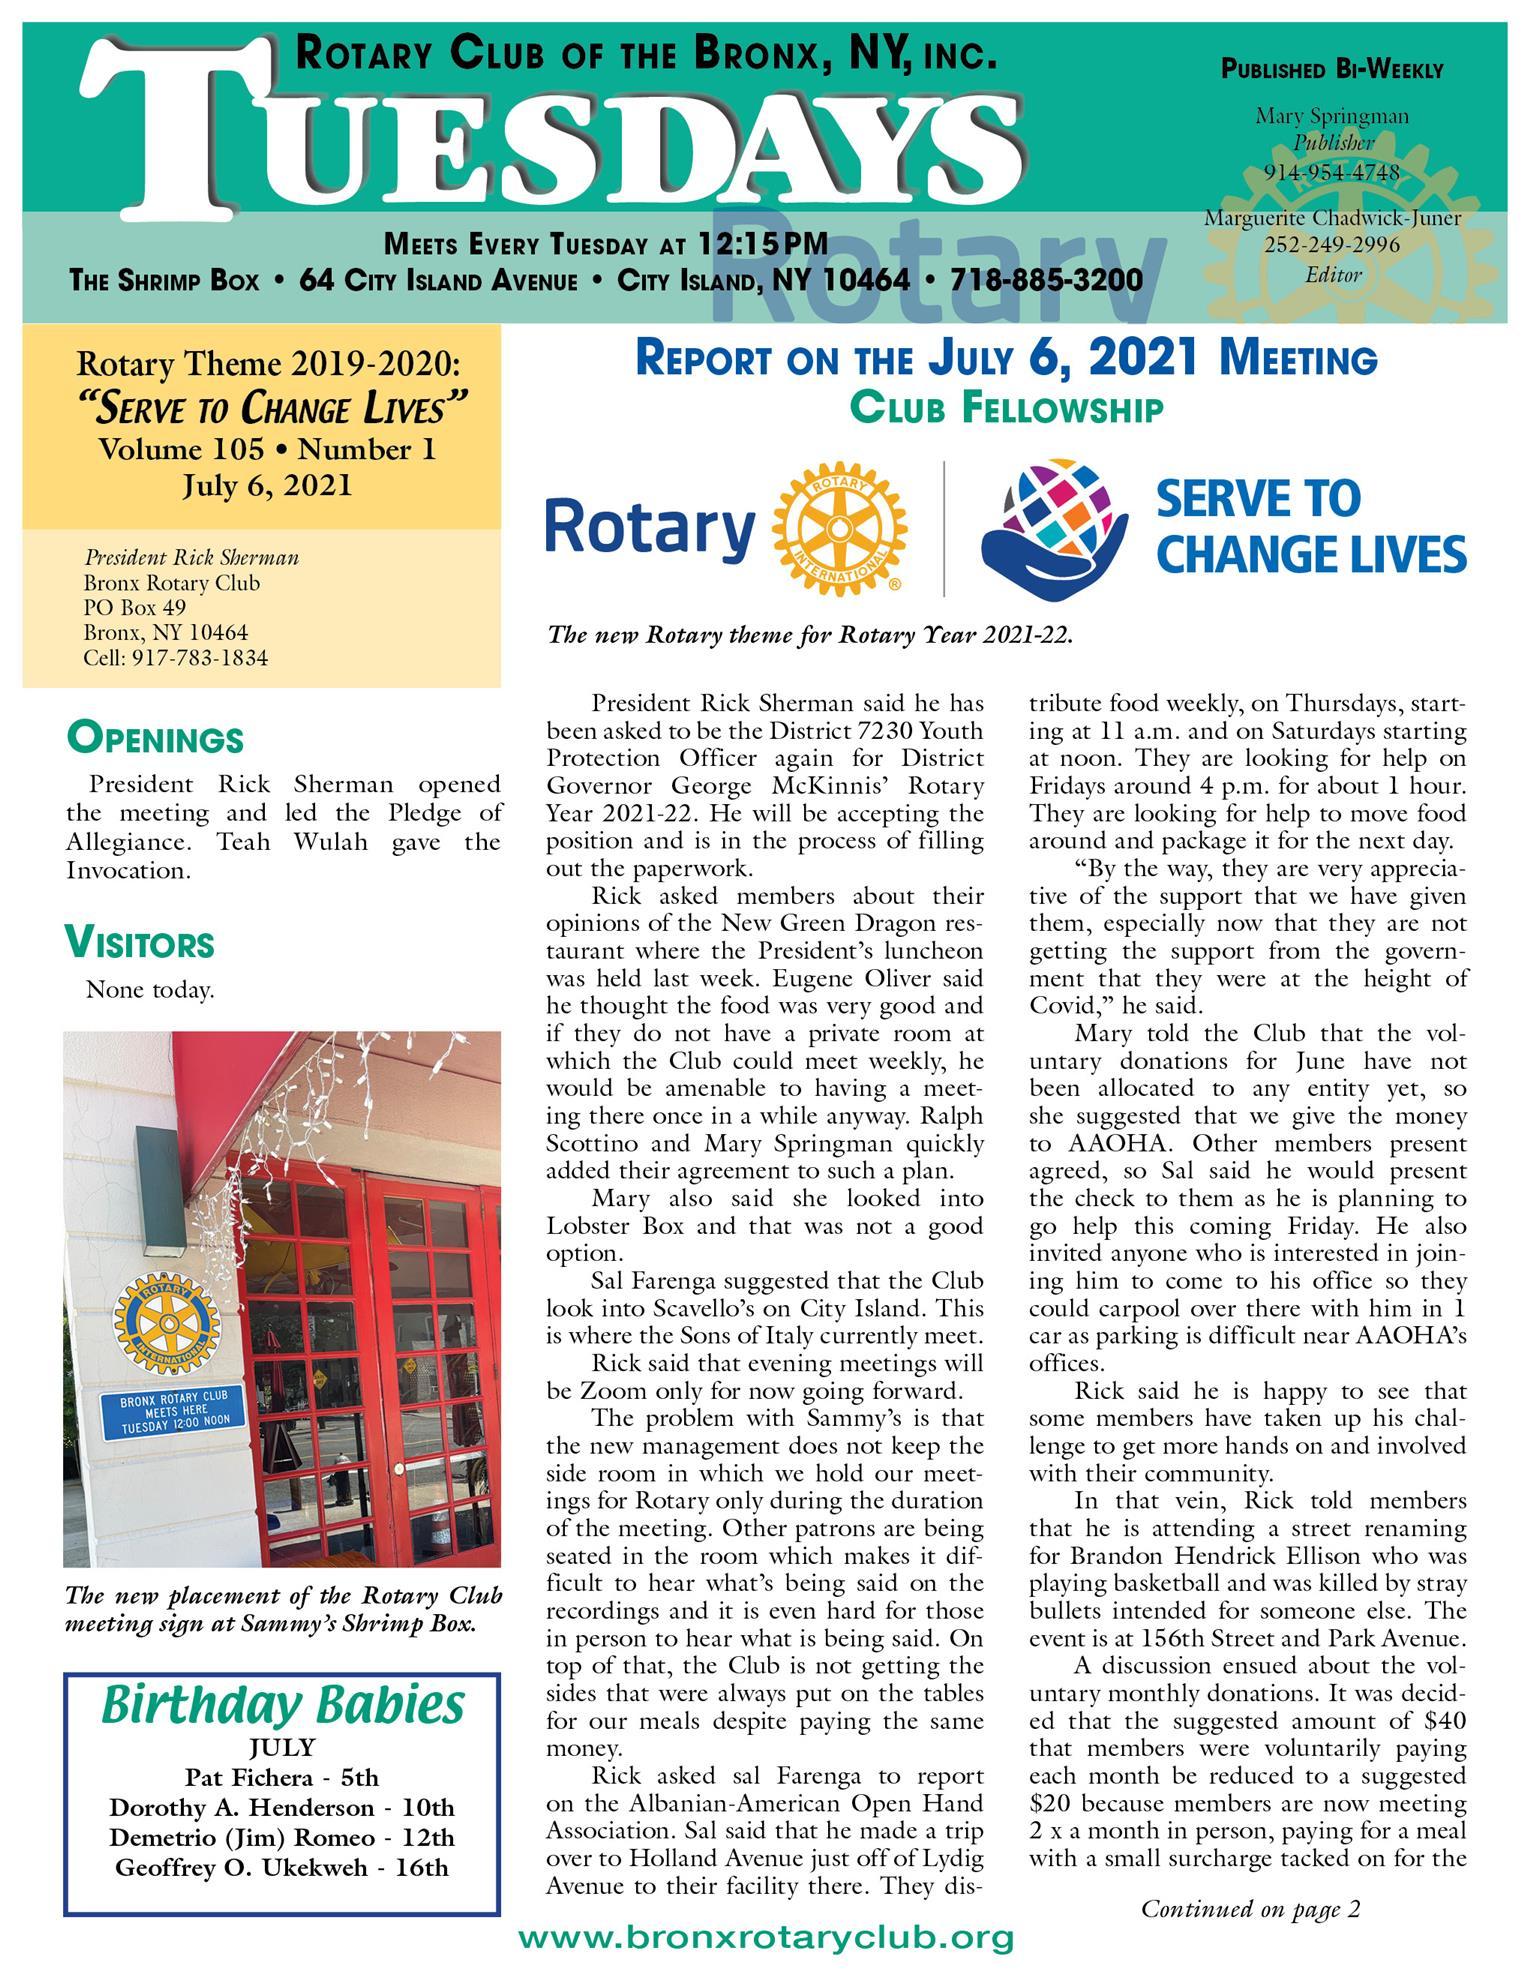 Tuesdays newsletter 7/6, 7/13 & 7/20/2021 p1